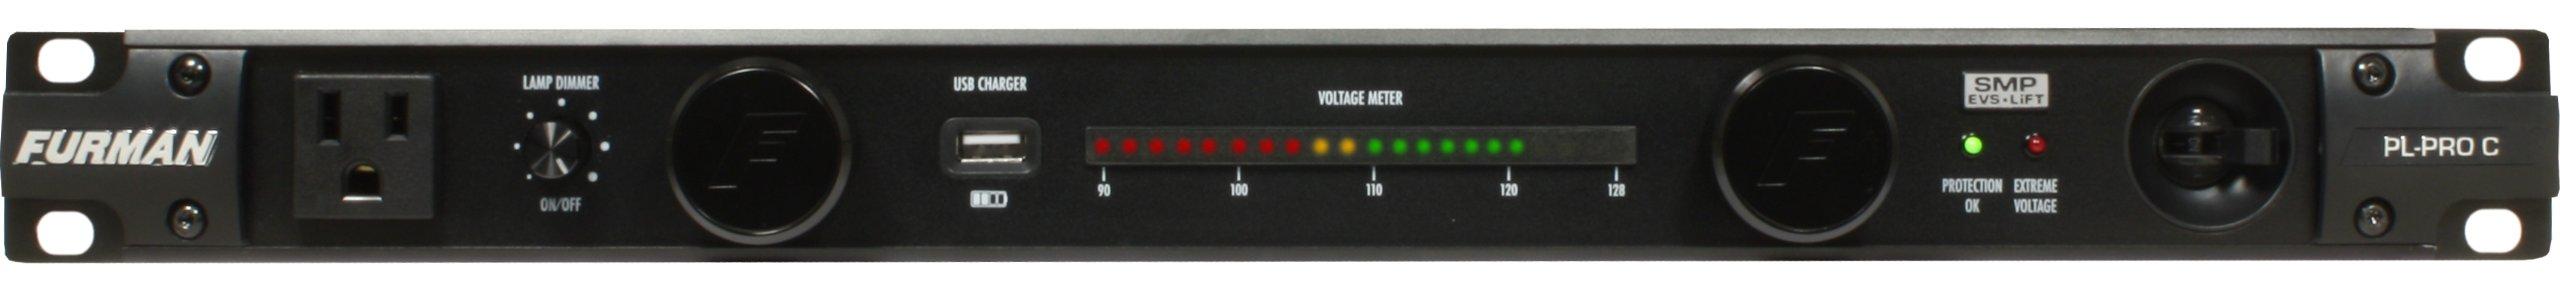 Furman PL-PRO C 20 Amp Advanced Level Power Conditioner